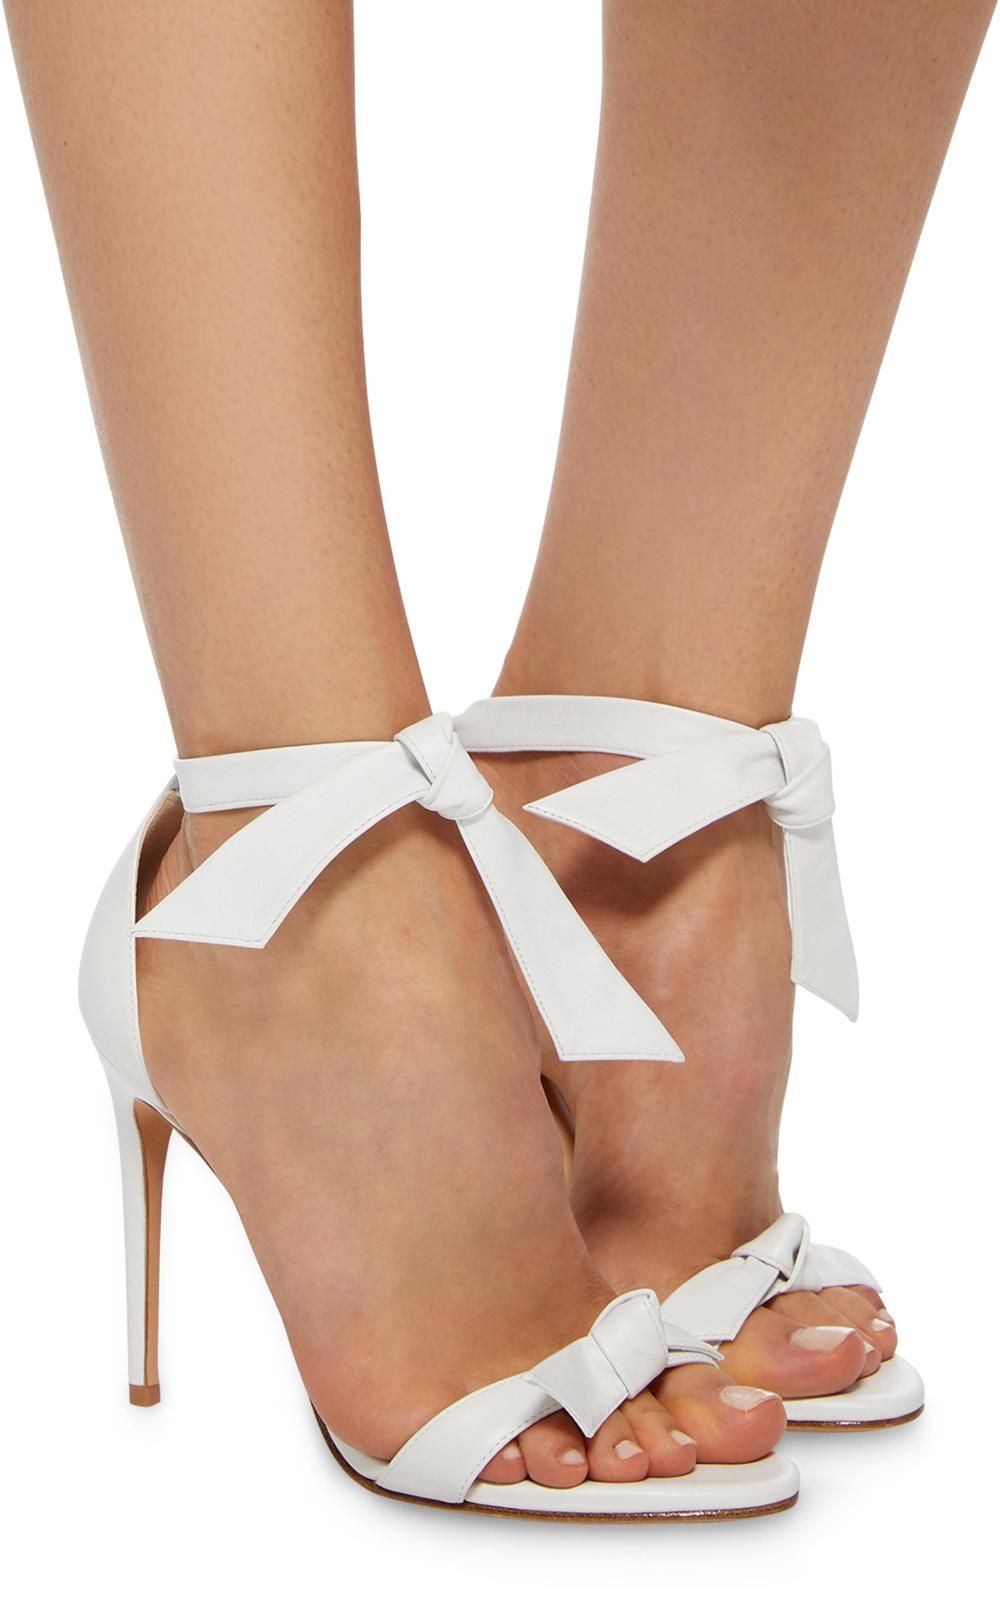 Leather sandals, Bridal shoes